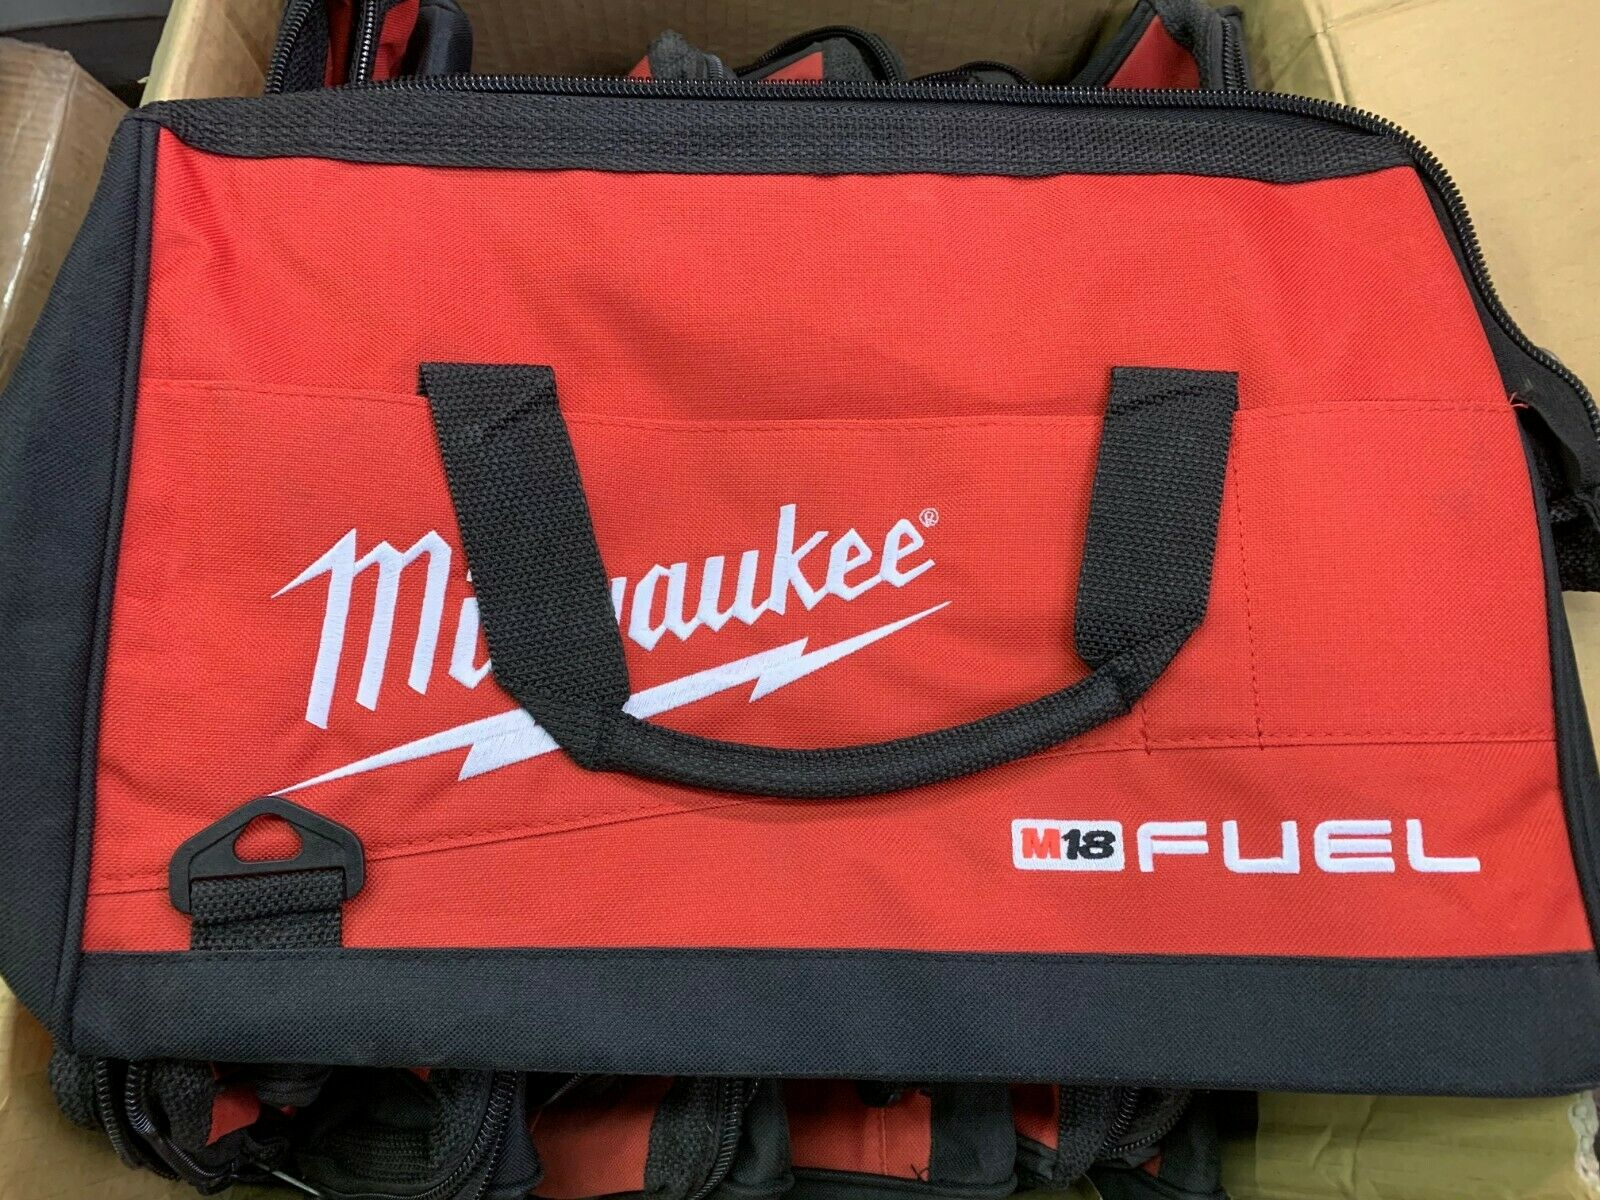 Milwaukee Heavy Duty M18 FUEL Tool Bag Fits 2730-21, 2730-22